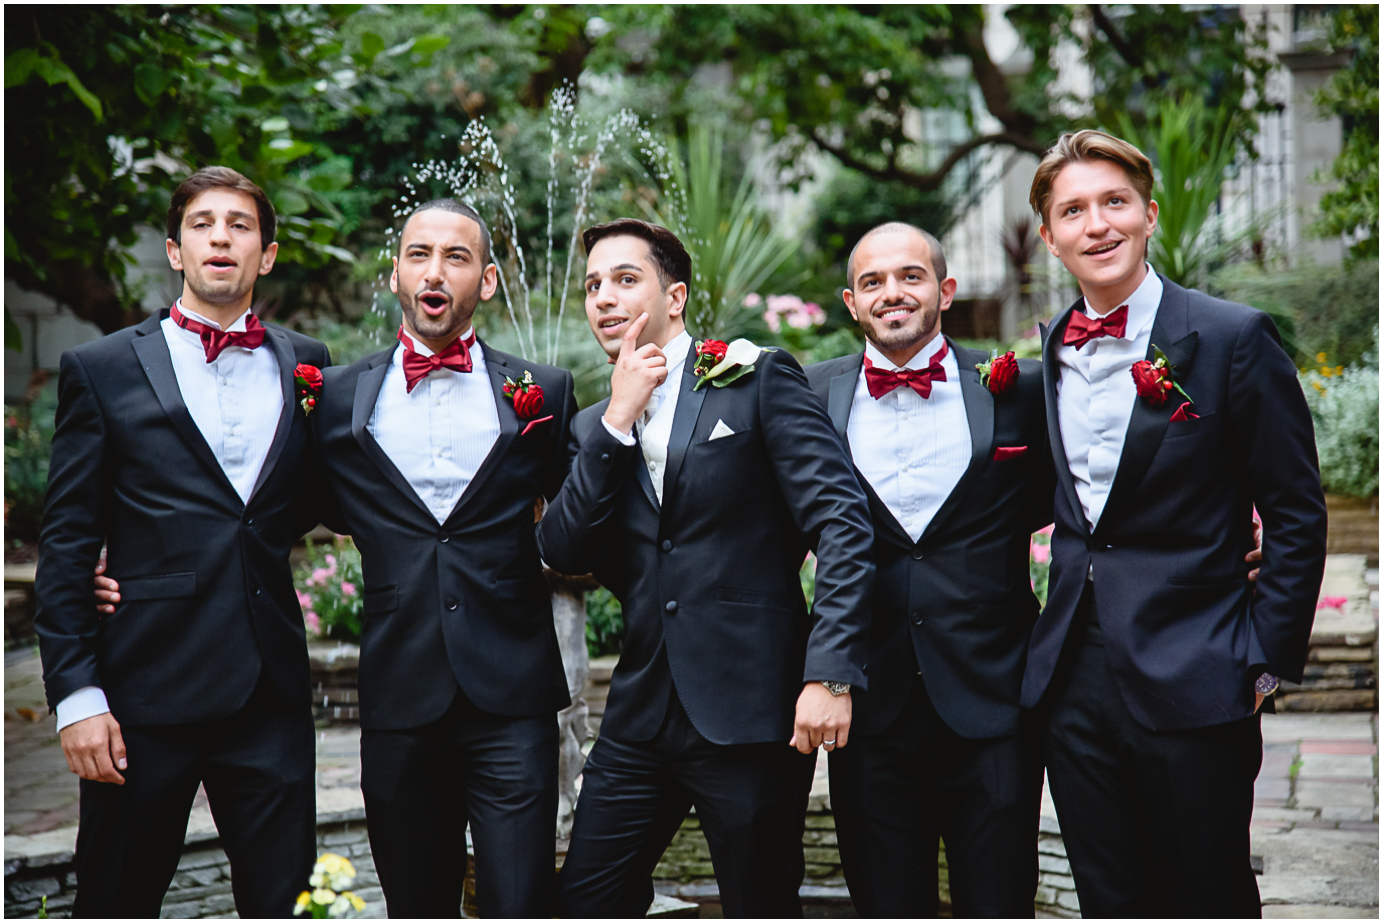 iranian wedding photographer 189 - Drapers Hall London Wedding Photographer